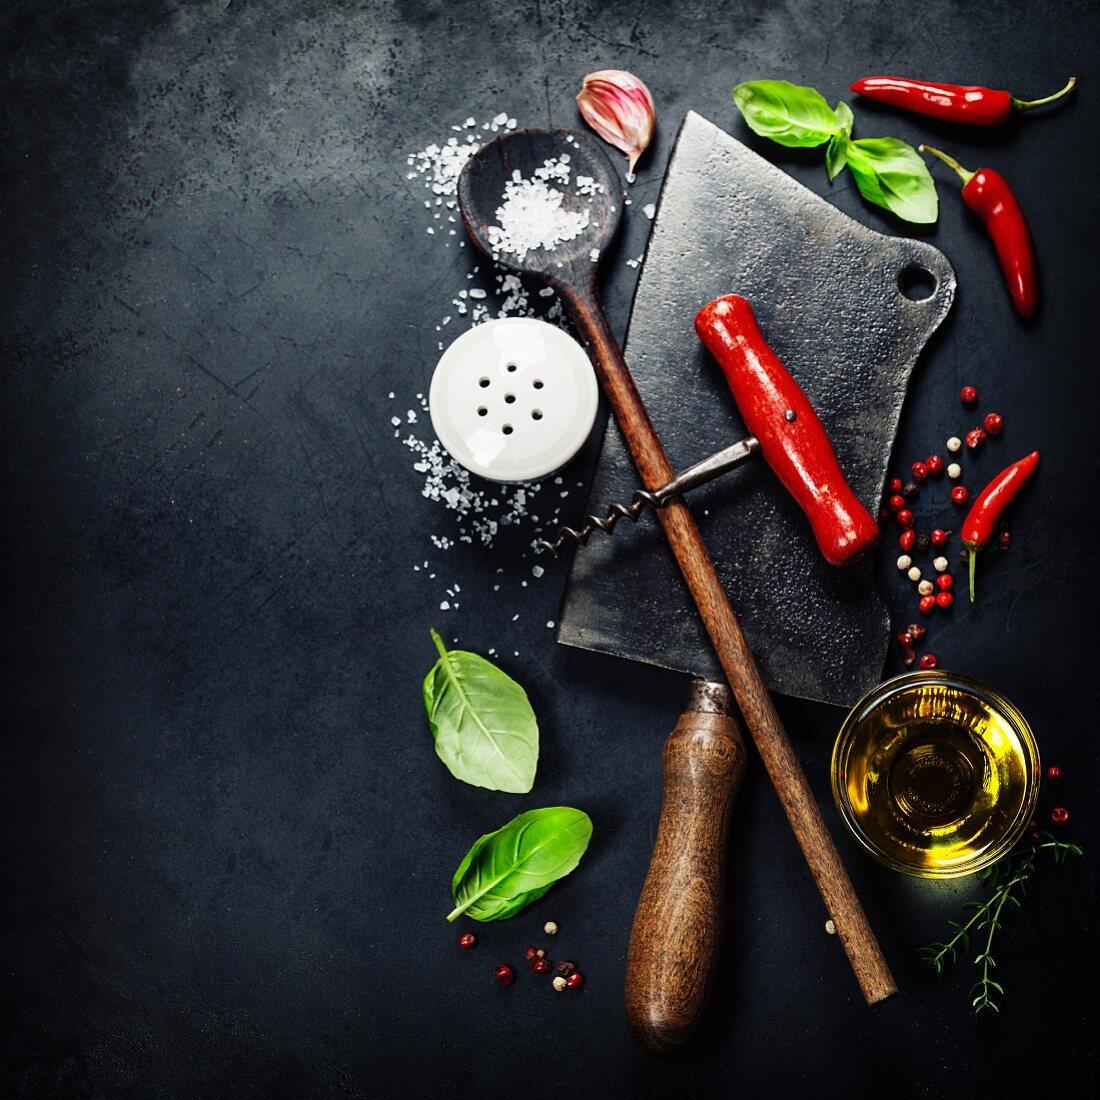 Vintage cutlery and fresh ingredients on dark background